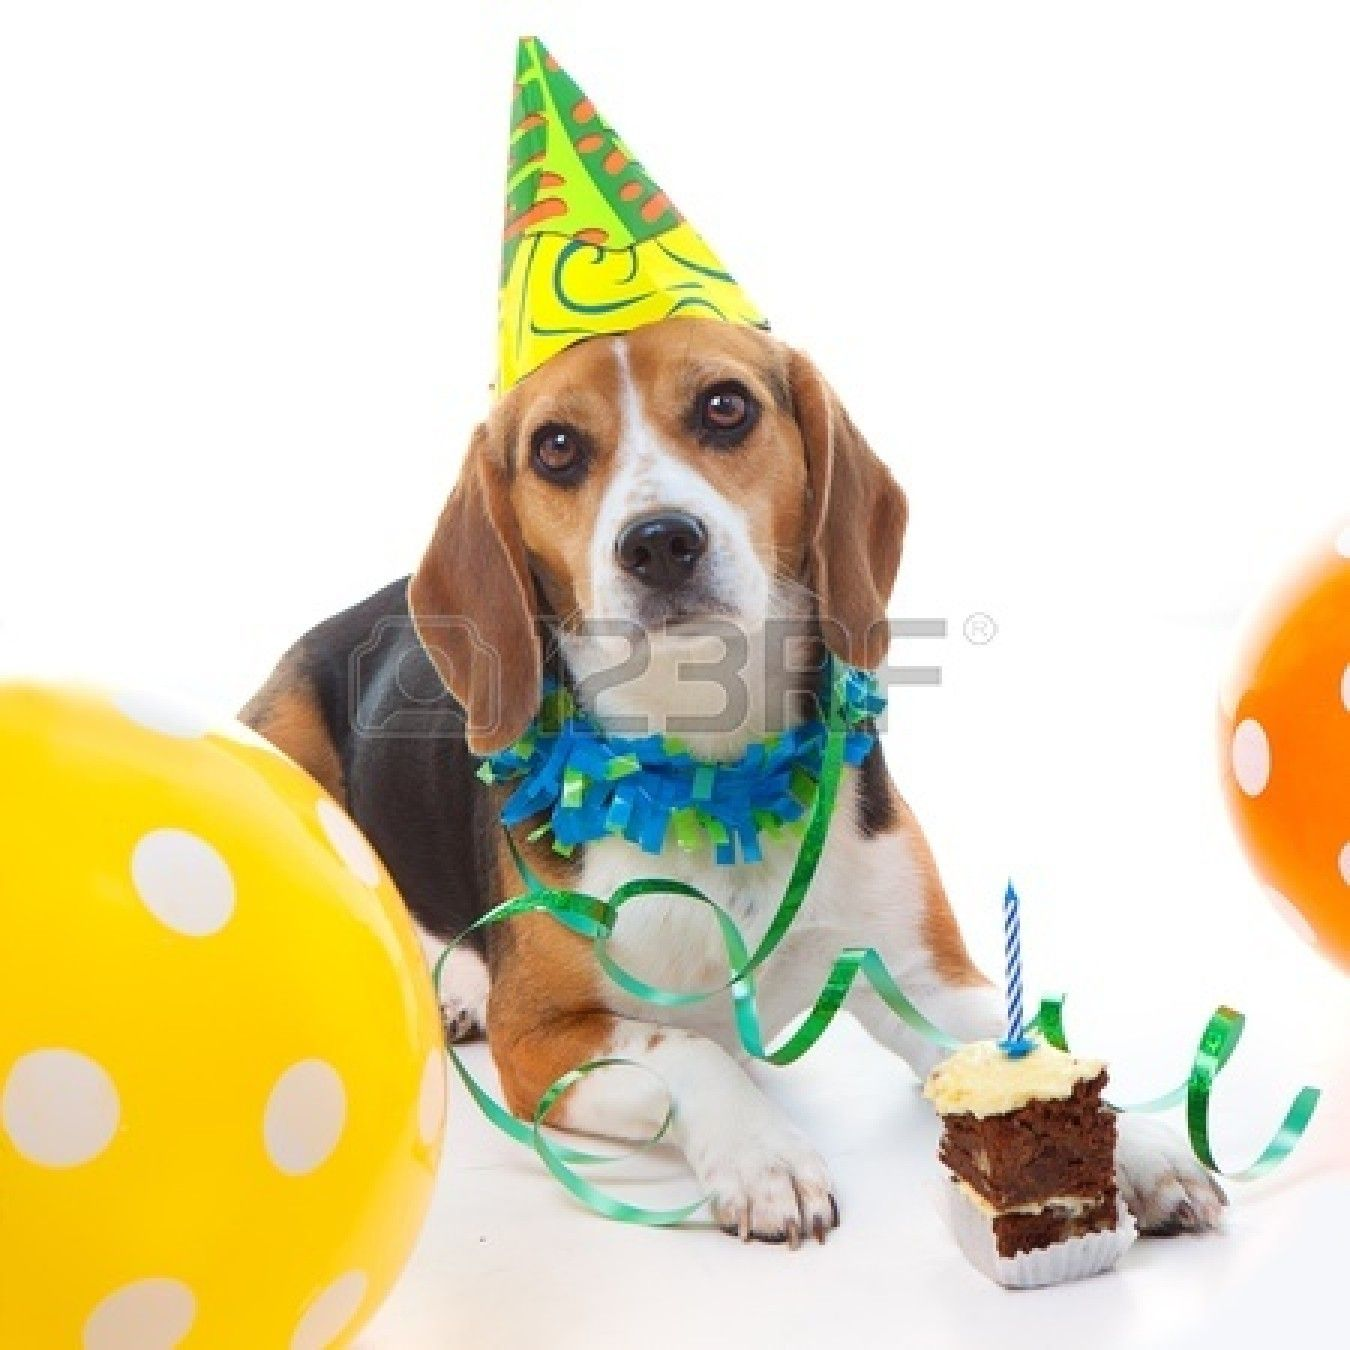 Pet Beagle Dog First Birthday Party Celebration With Cake Hat Happy Birthday Dog Dog First Birthday Dog Birthday